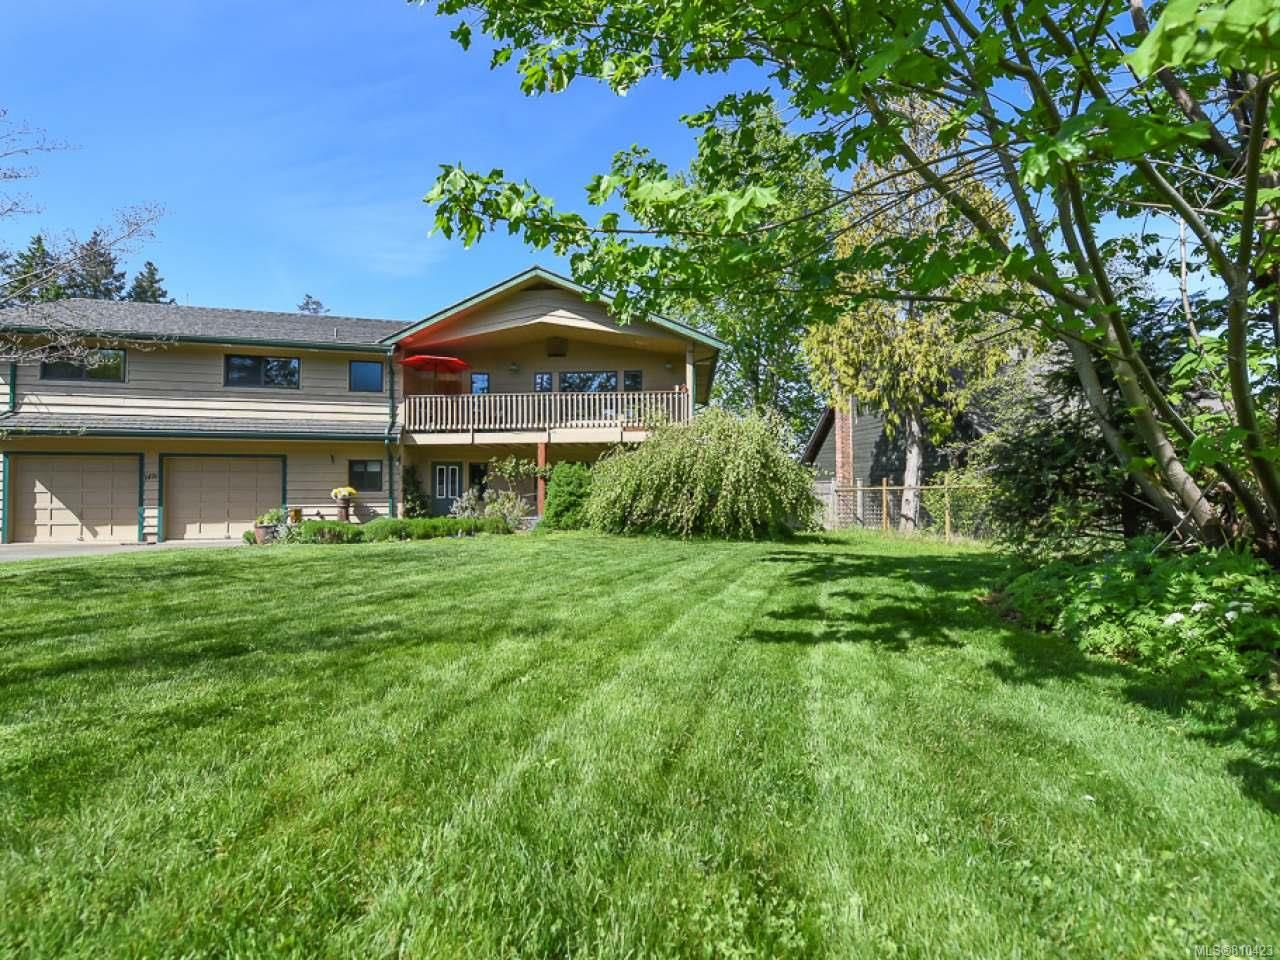 Main Photo: 1476 Jackson Dr in COMOX: CV Comox Peninsula House for sale (Comox Valley)  : MLS®# 810423